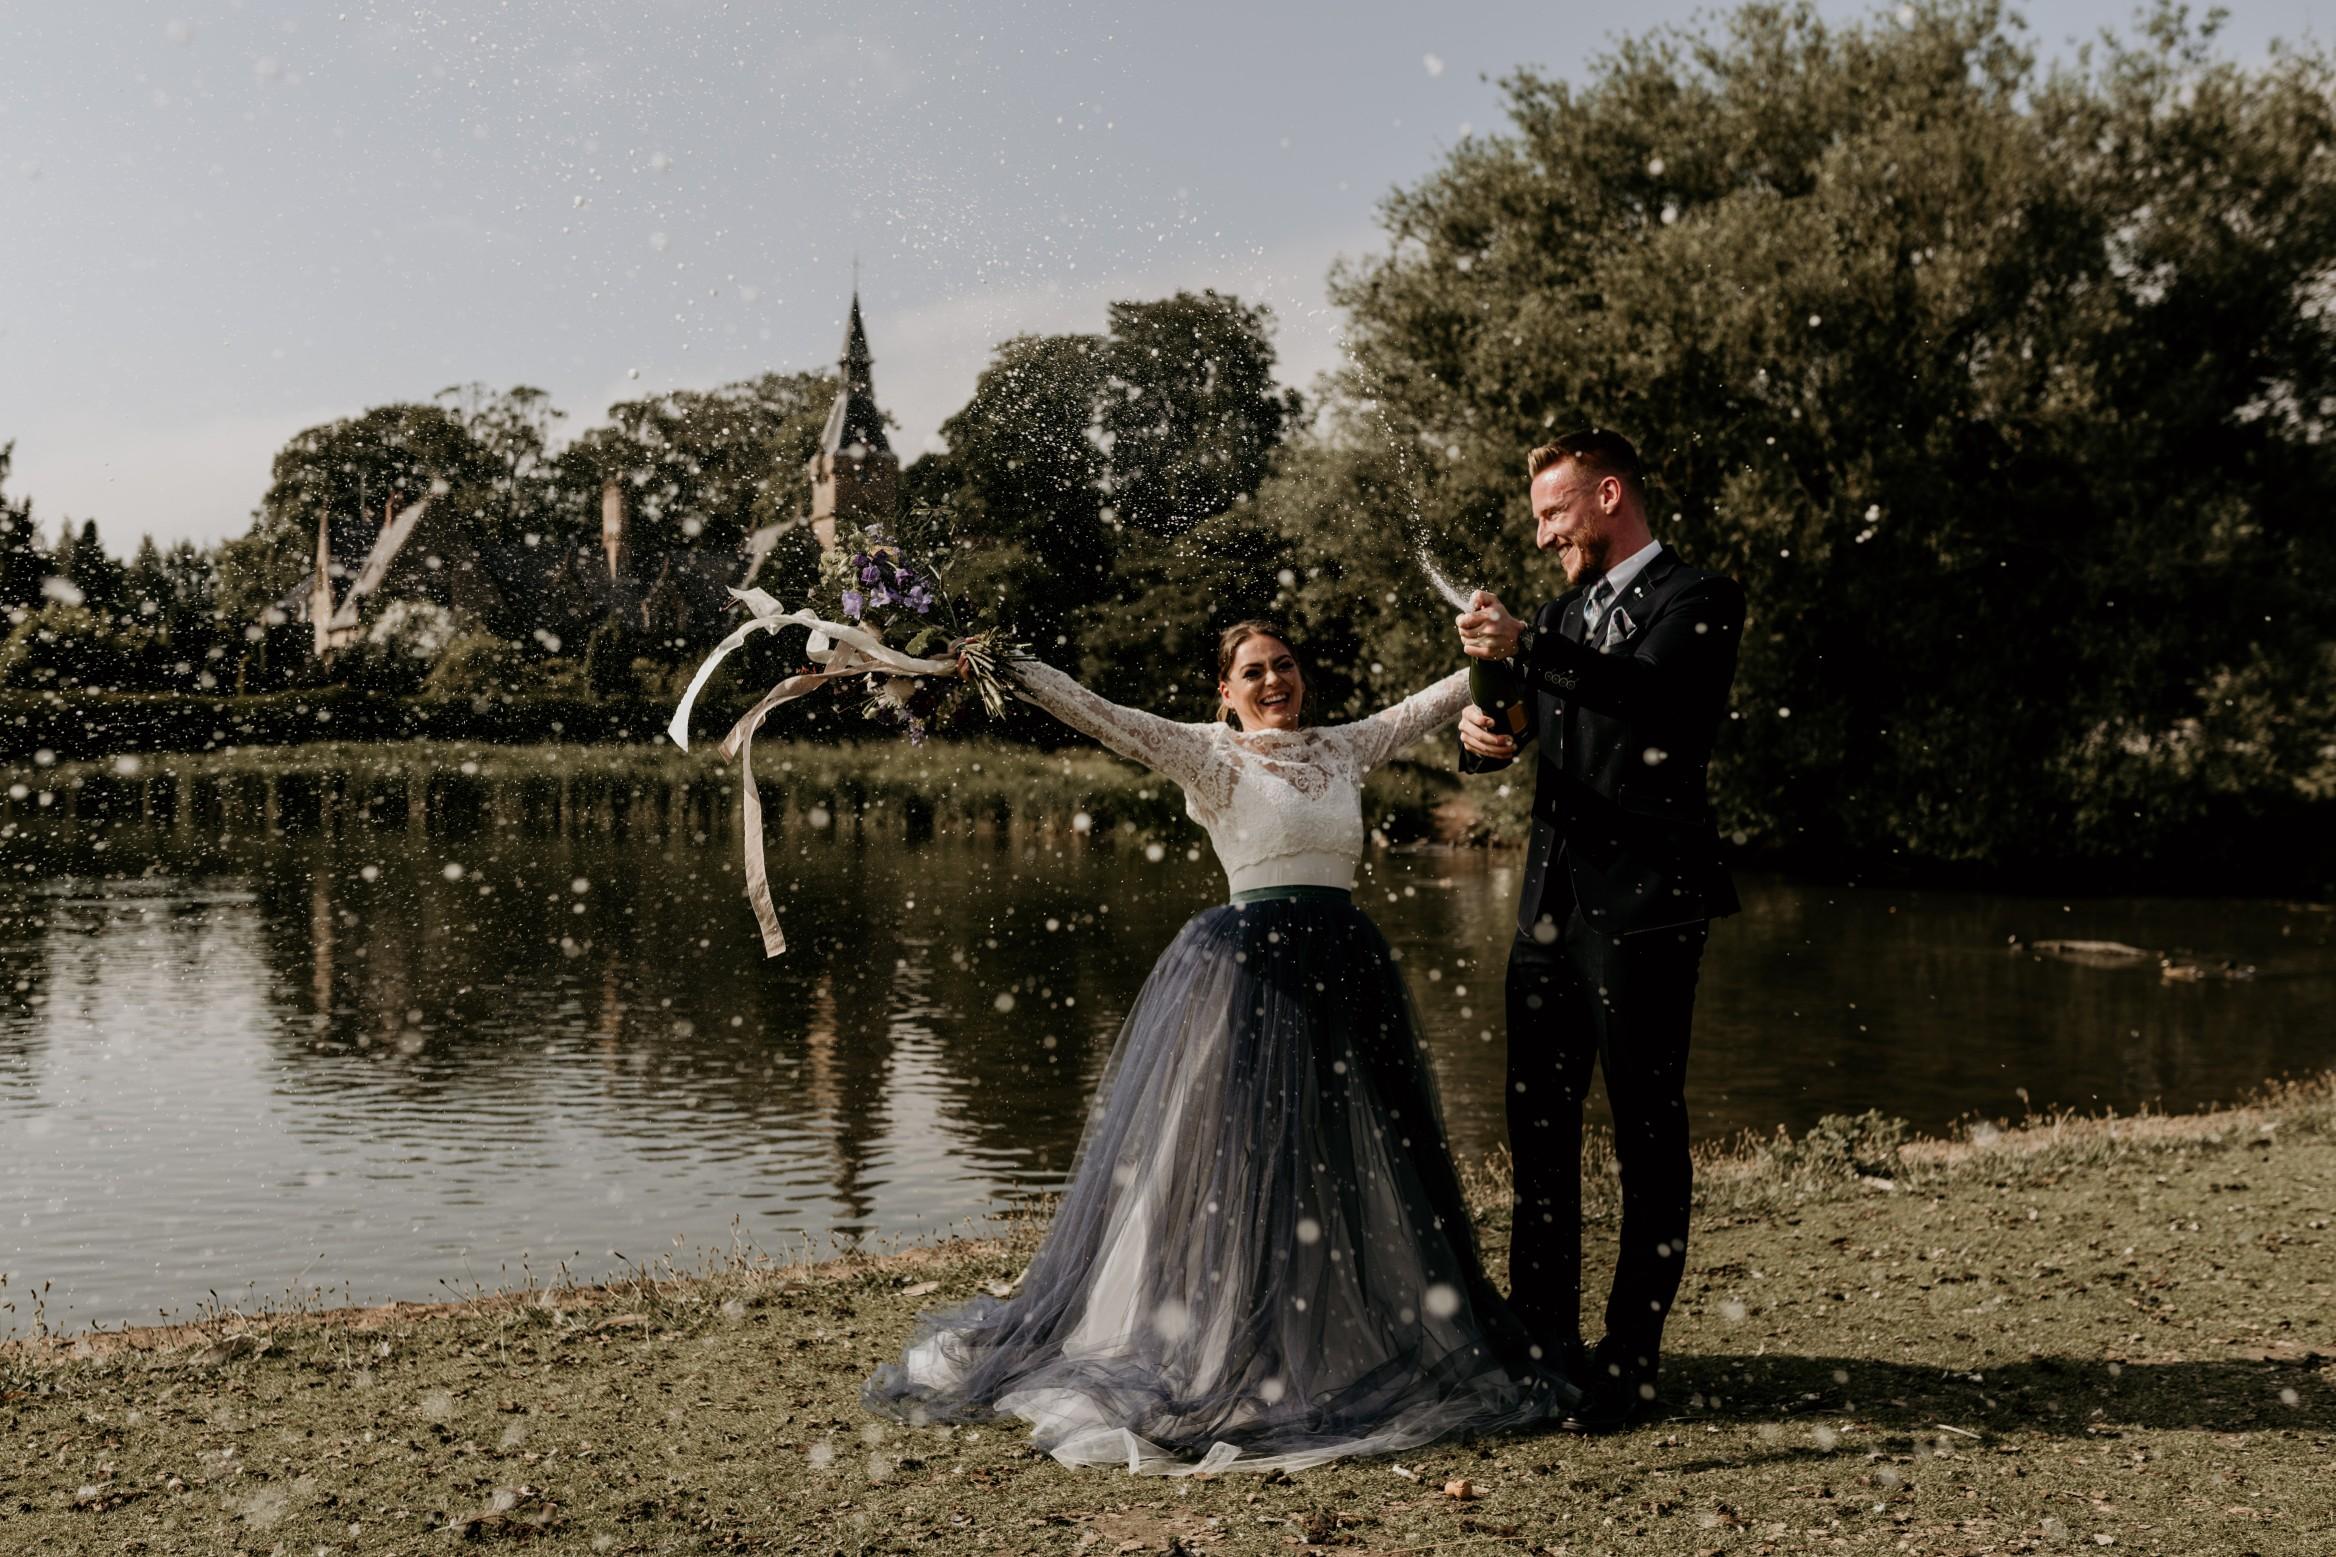 country garden wedding at newstead abbey - wedding champagne photo - unconventional wedding